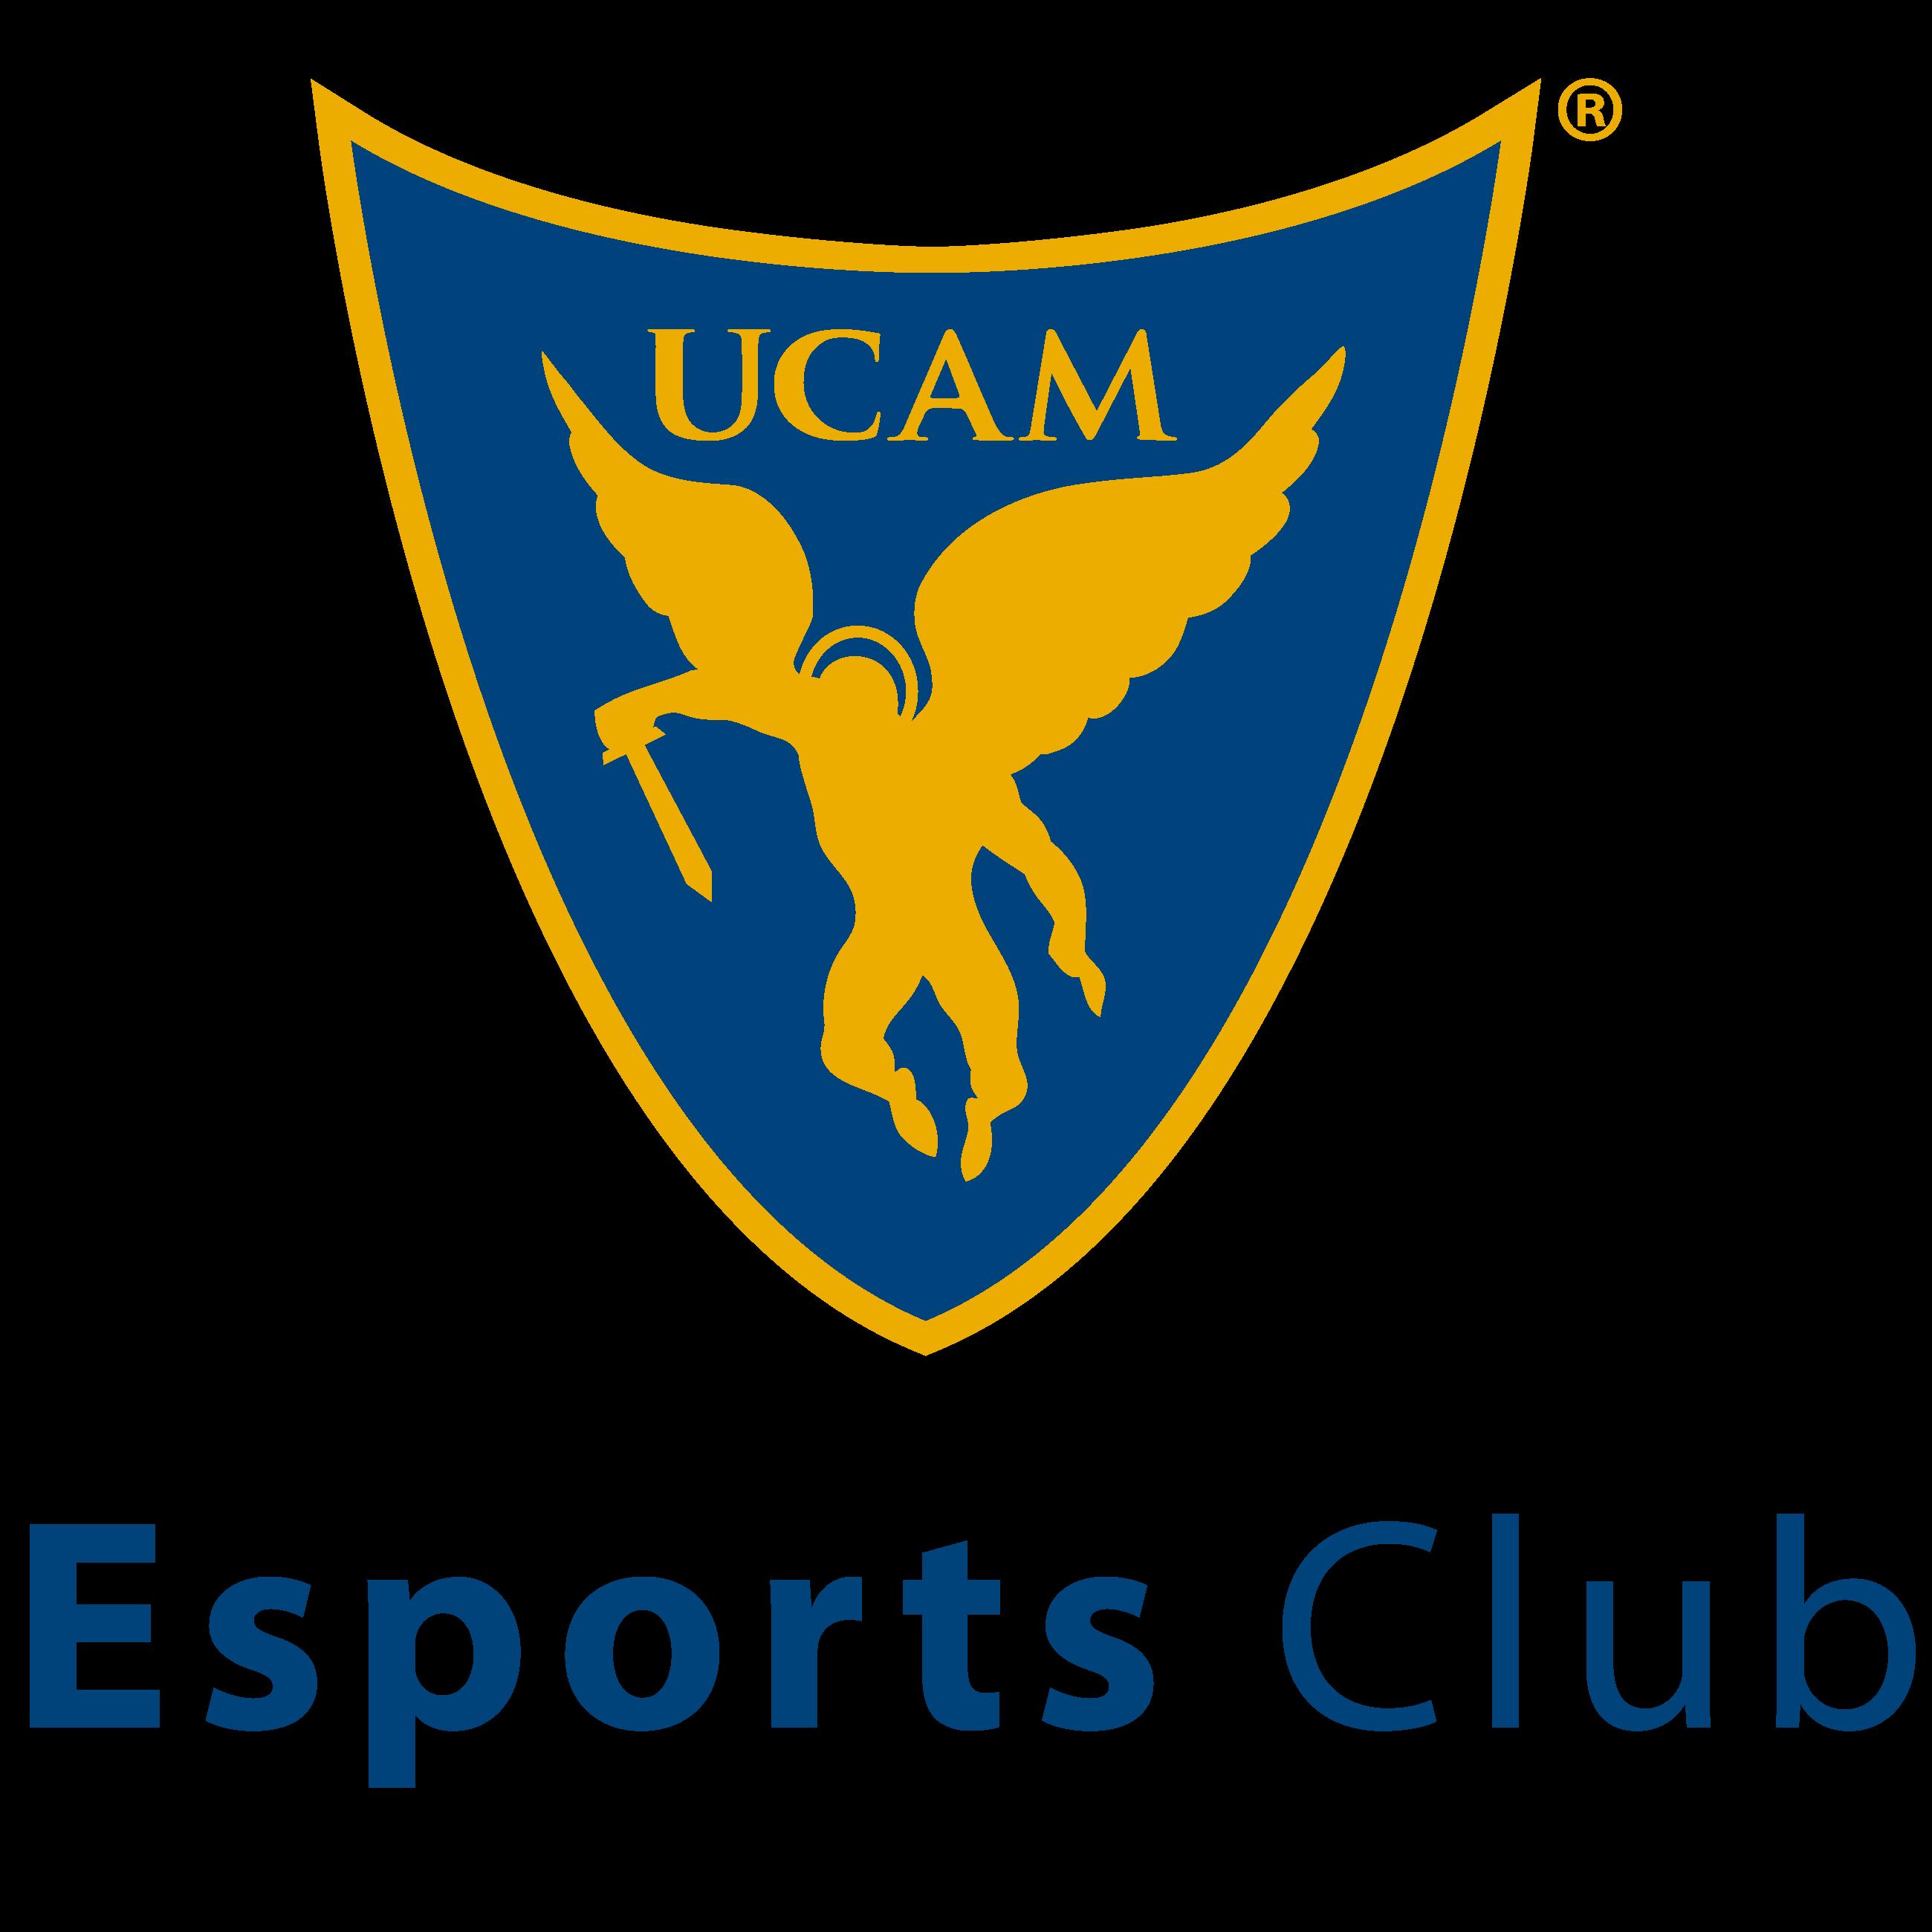 UCAM Esports Club  Team